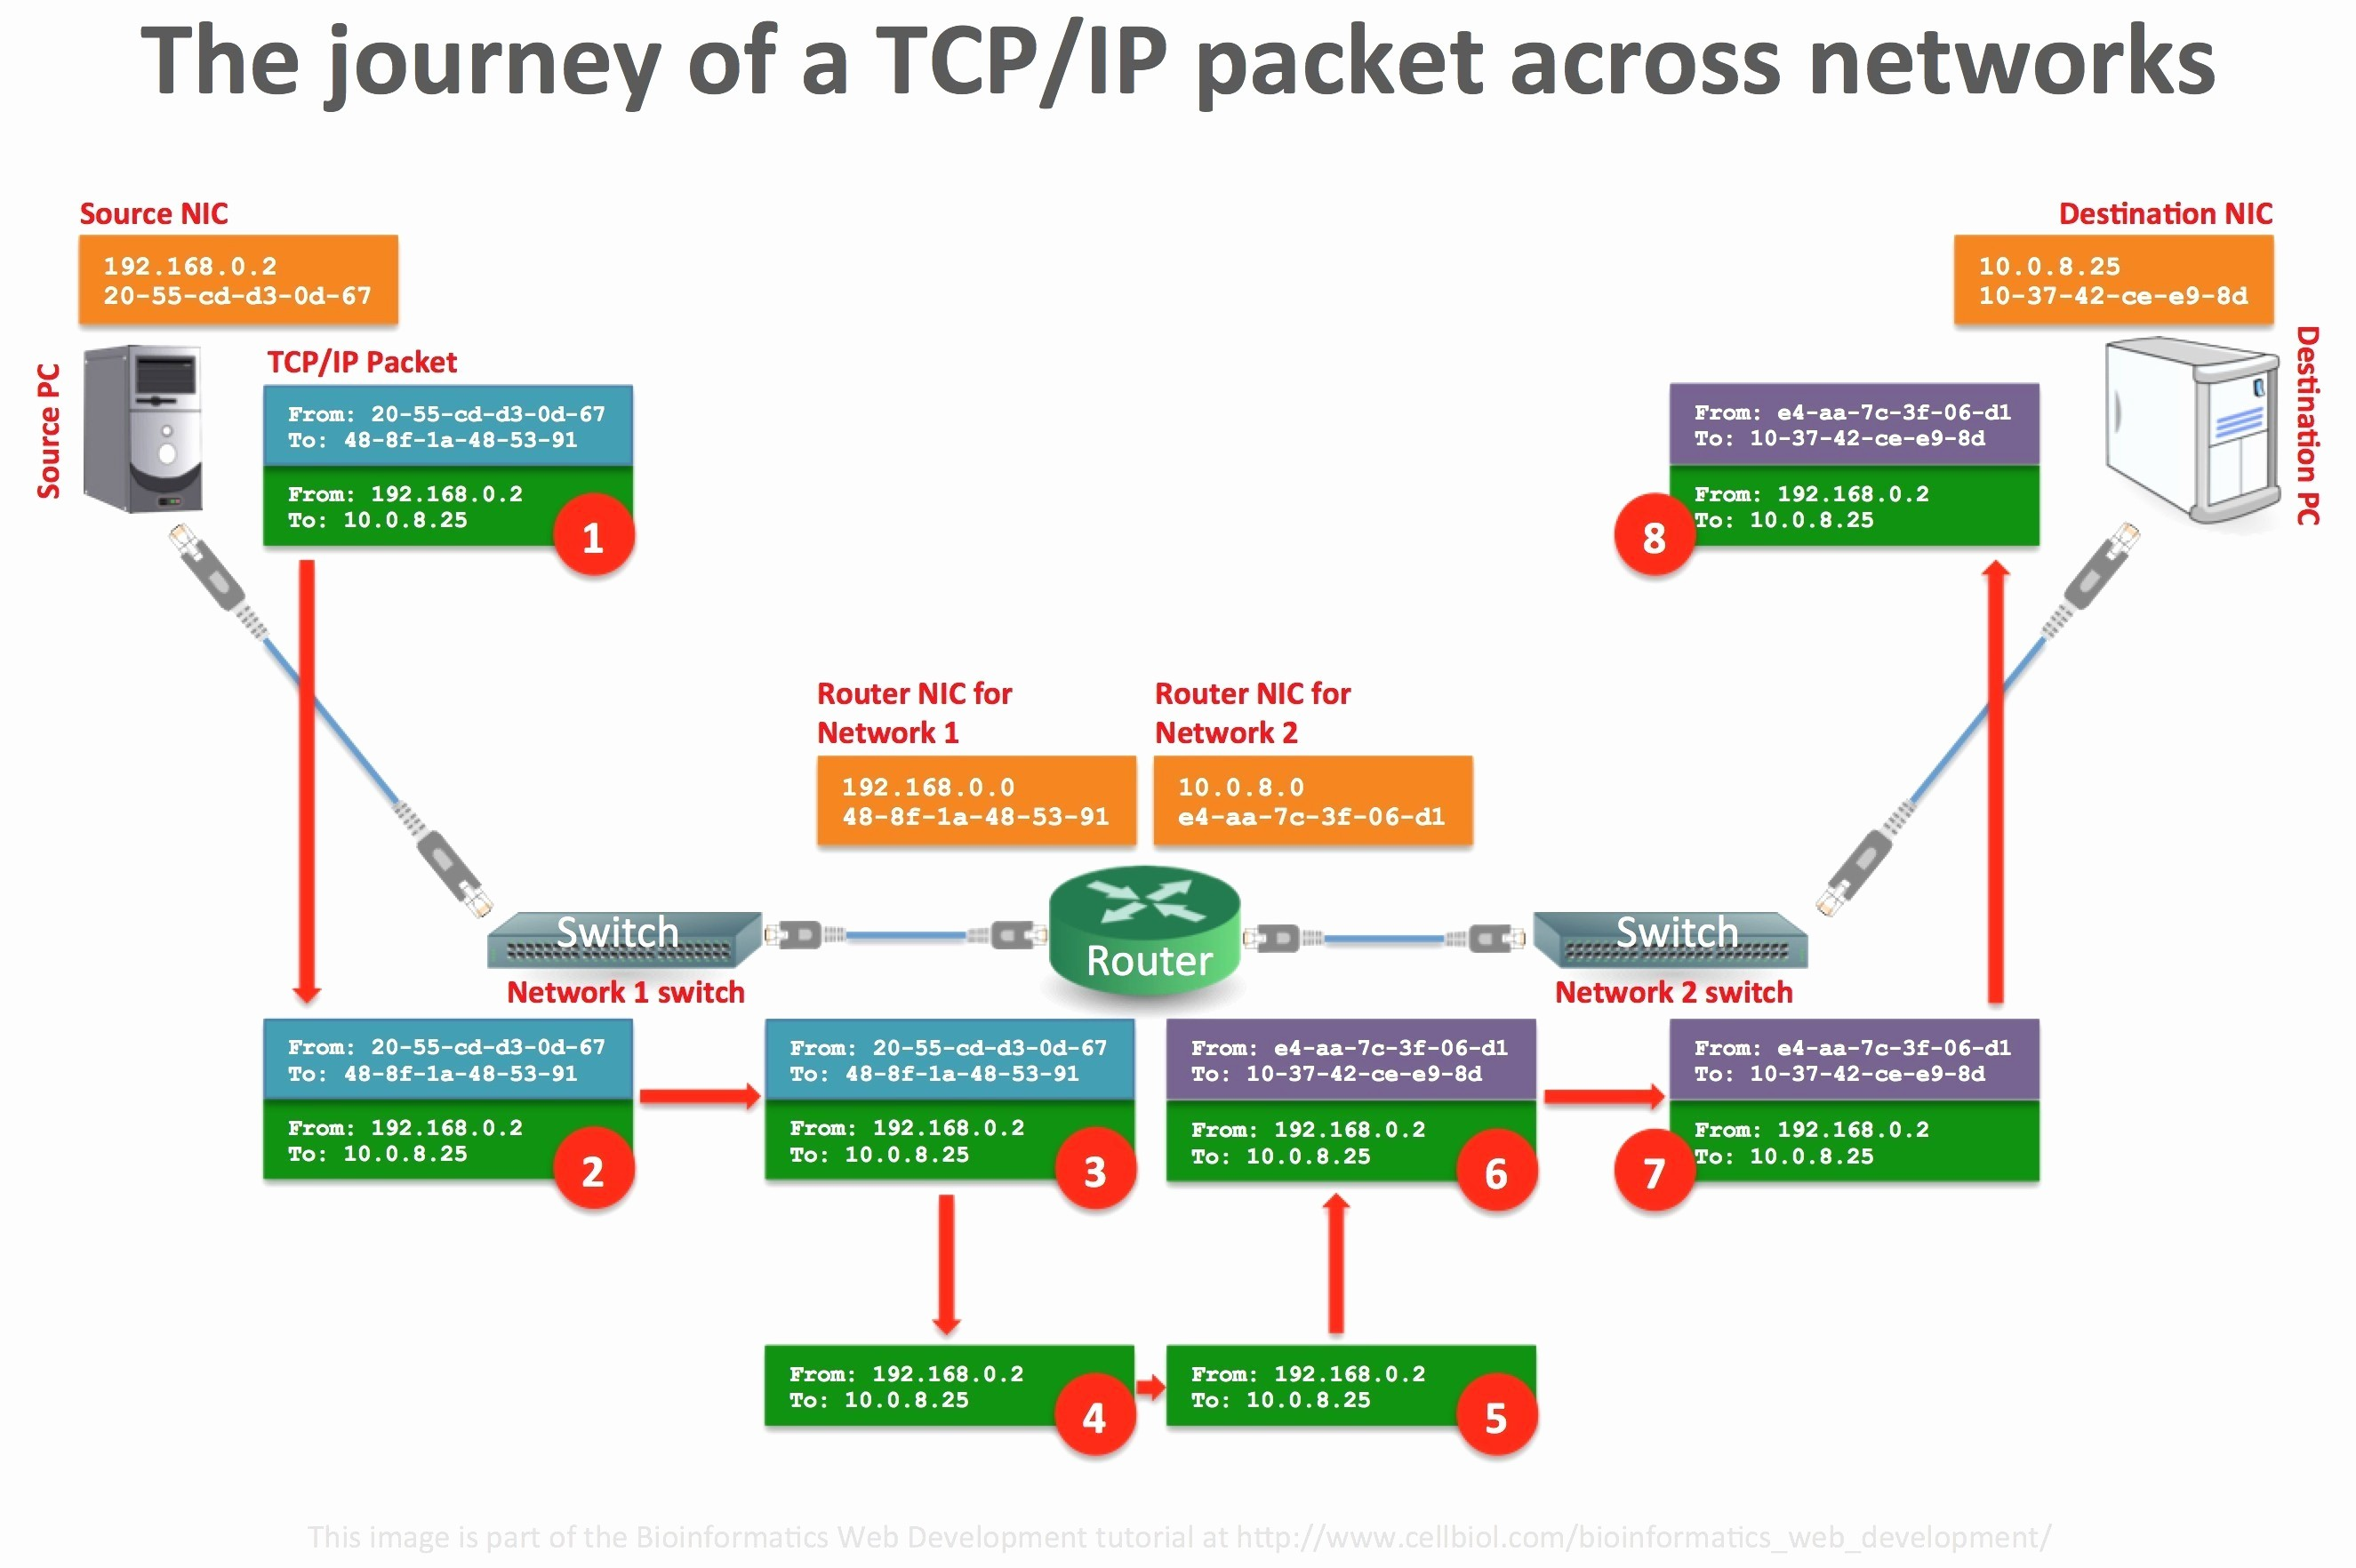 Visio Network Diagram Stencils for Network Diagram softwares New Network Diagram Sample Inspirational